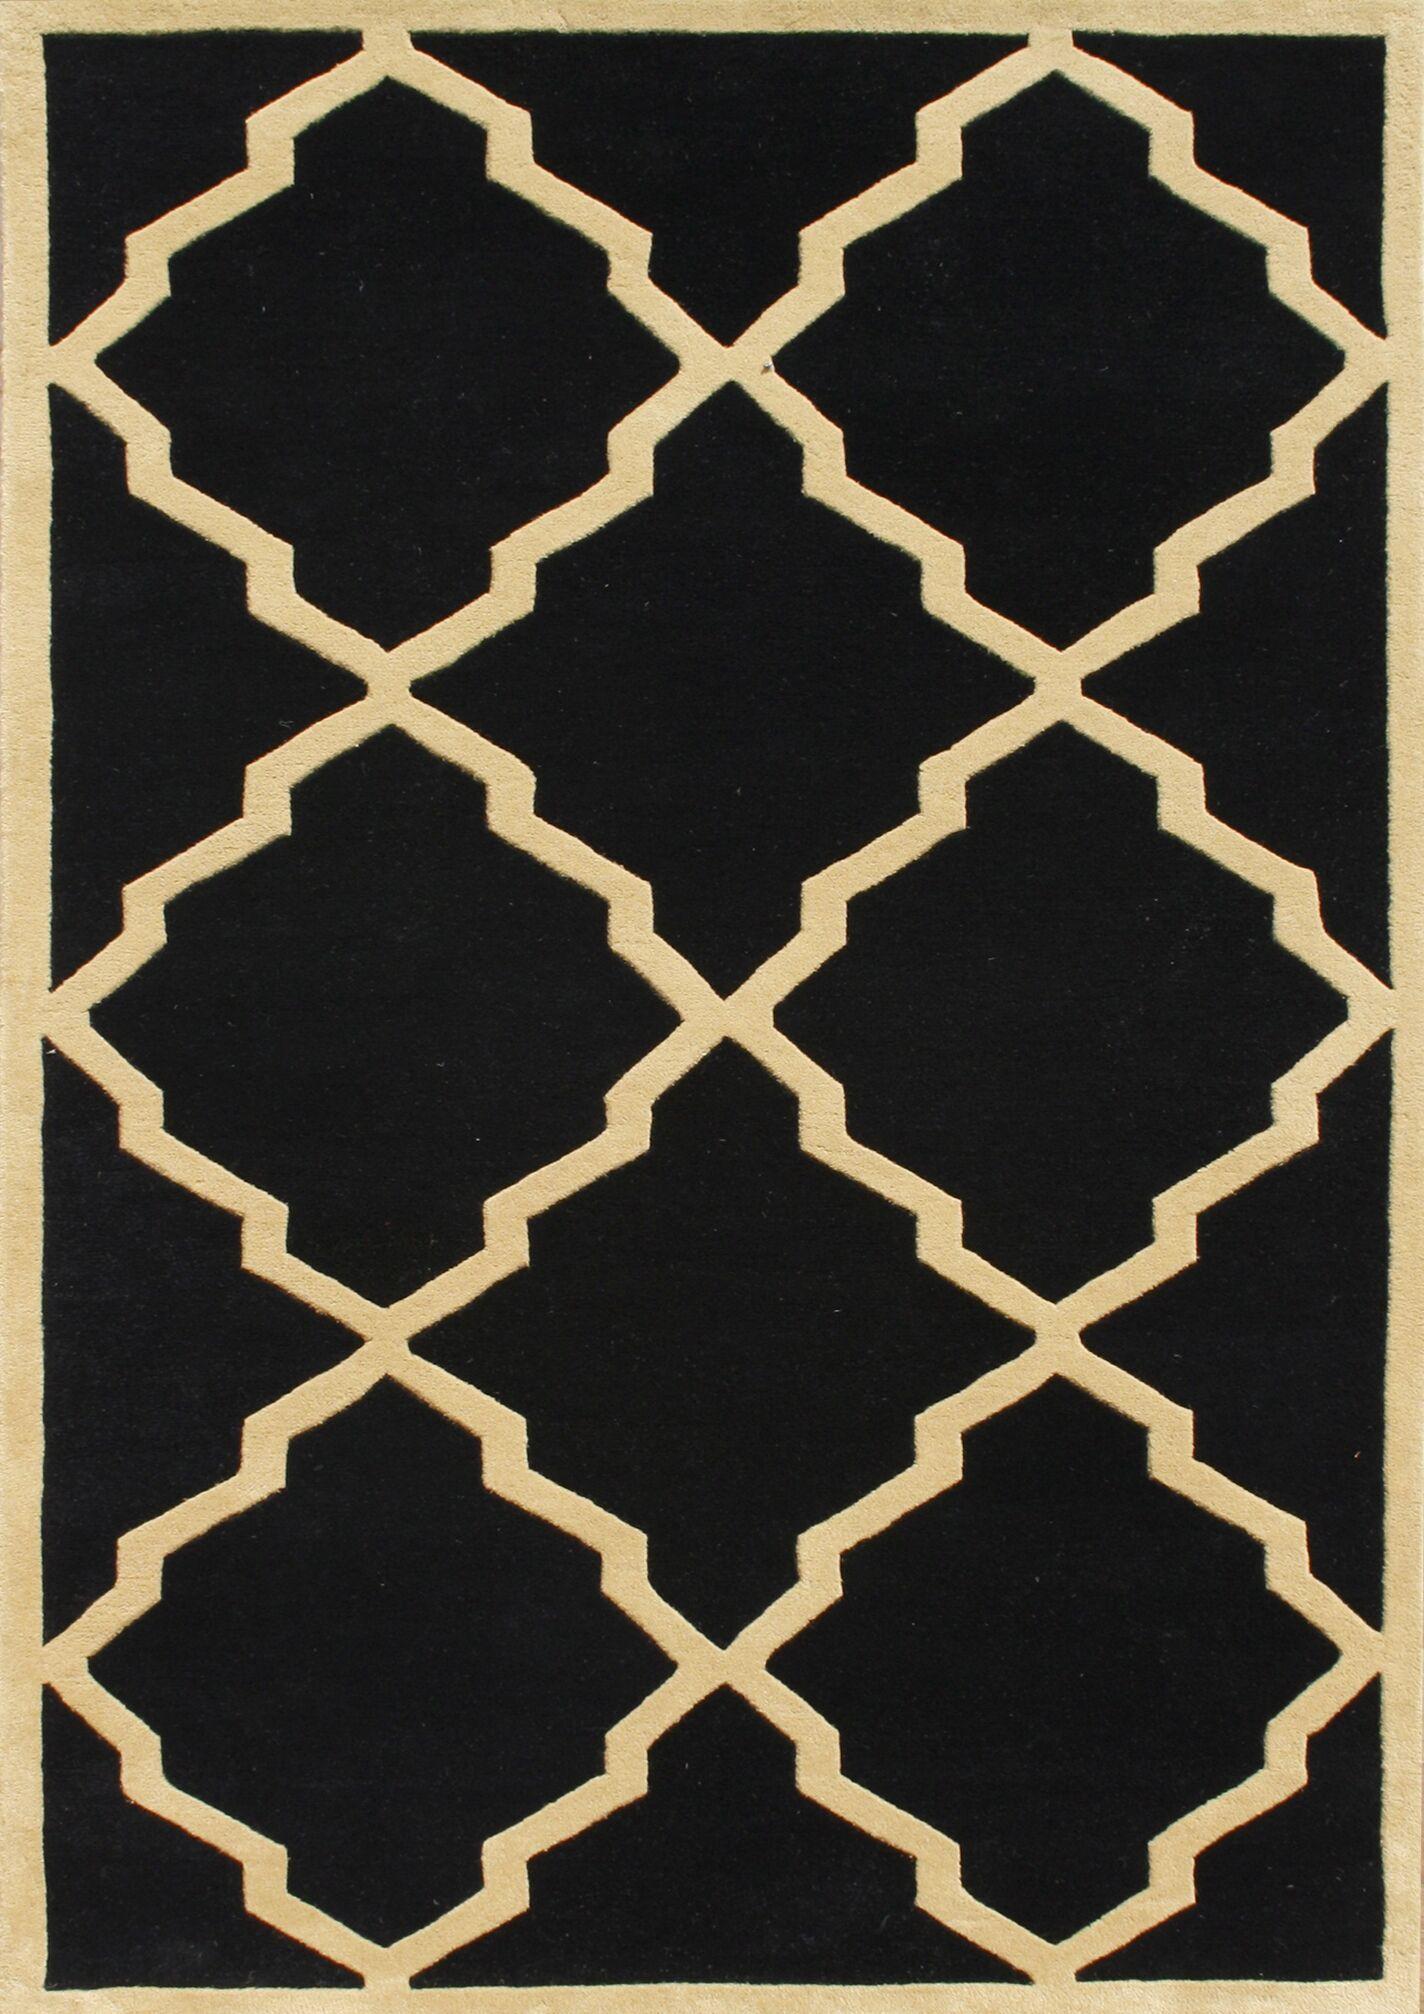 Jamestown Hand-Woven Black Area Rug Rug Size: 7' x 9'